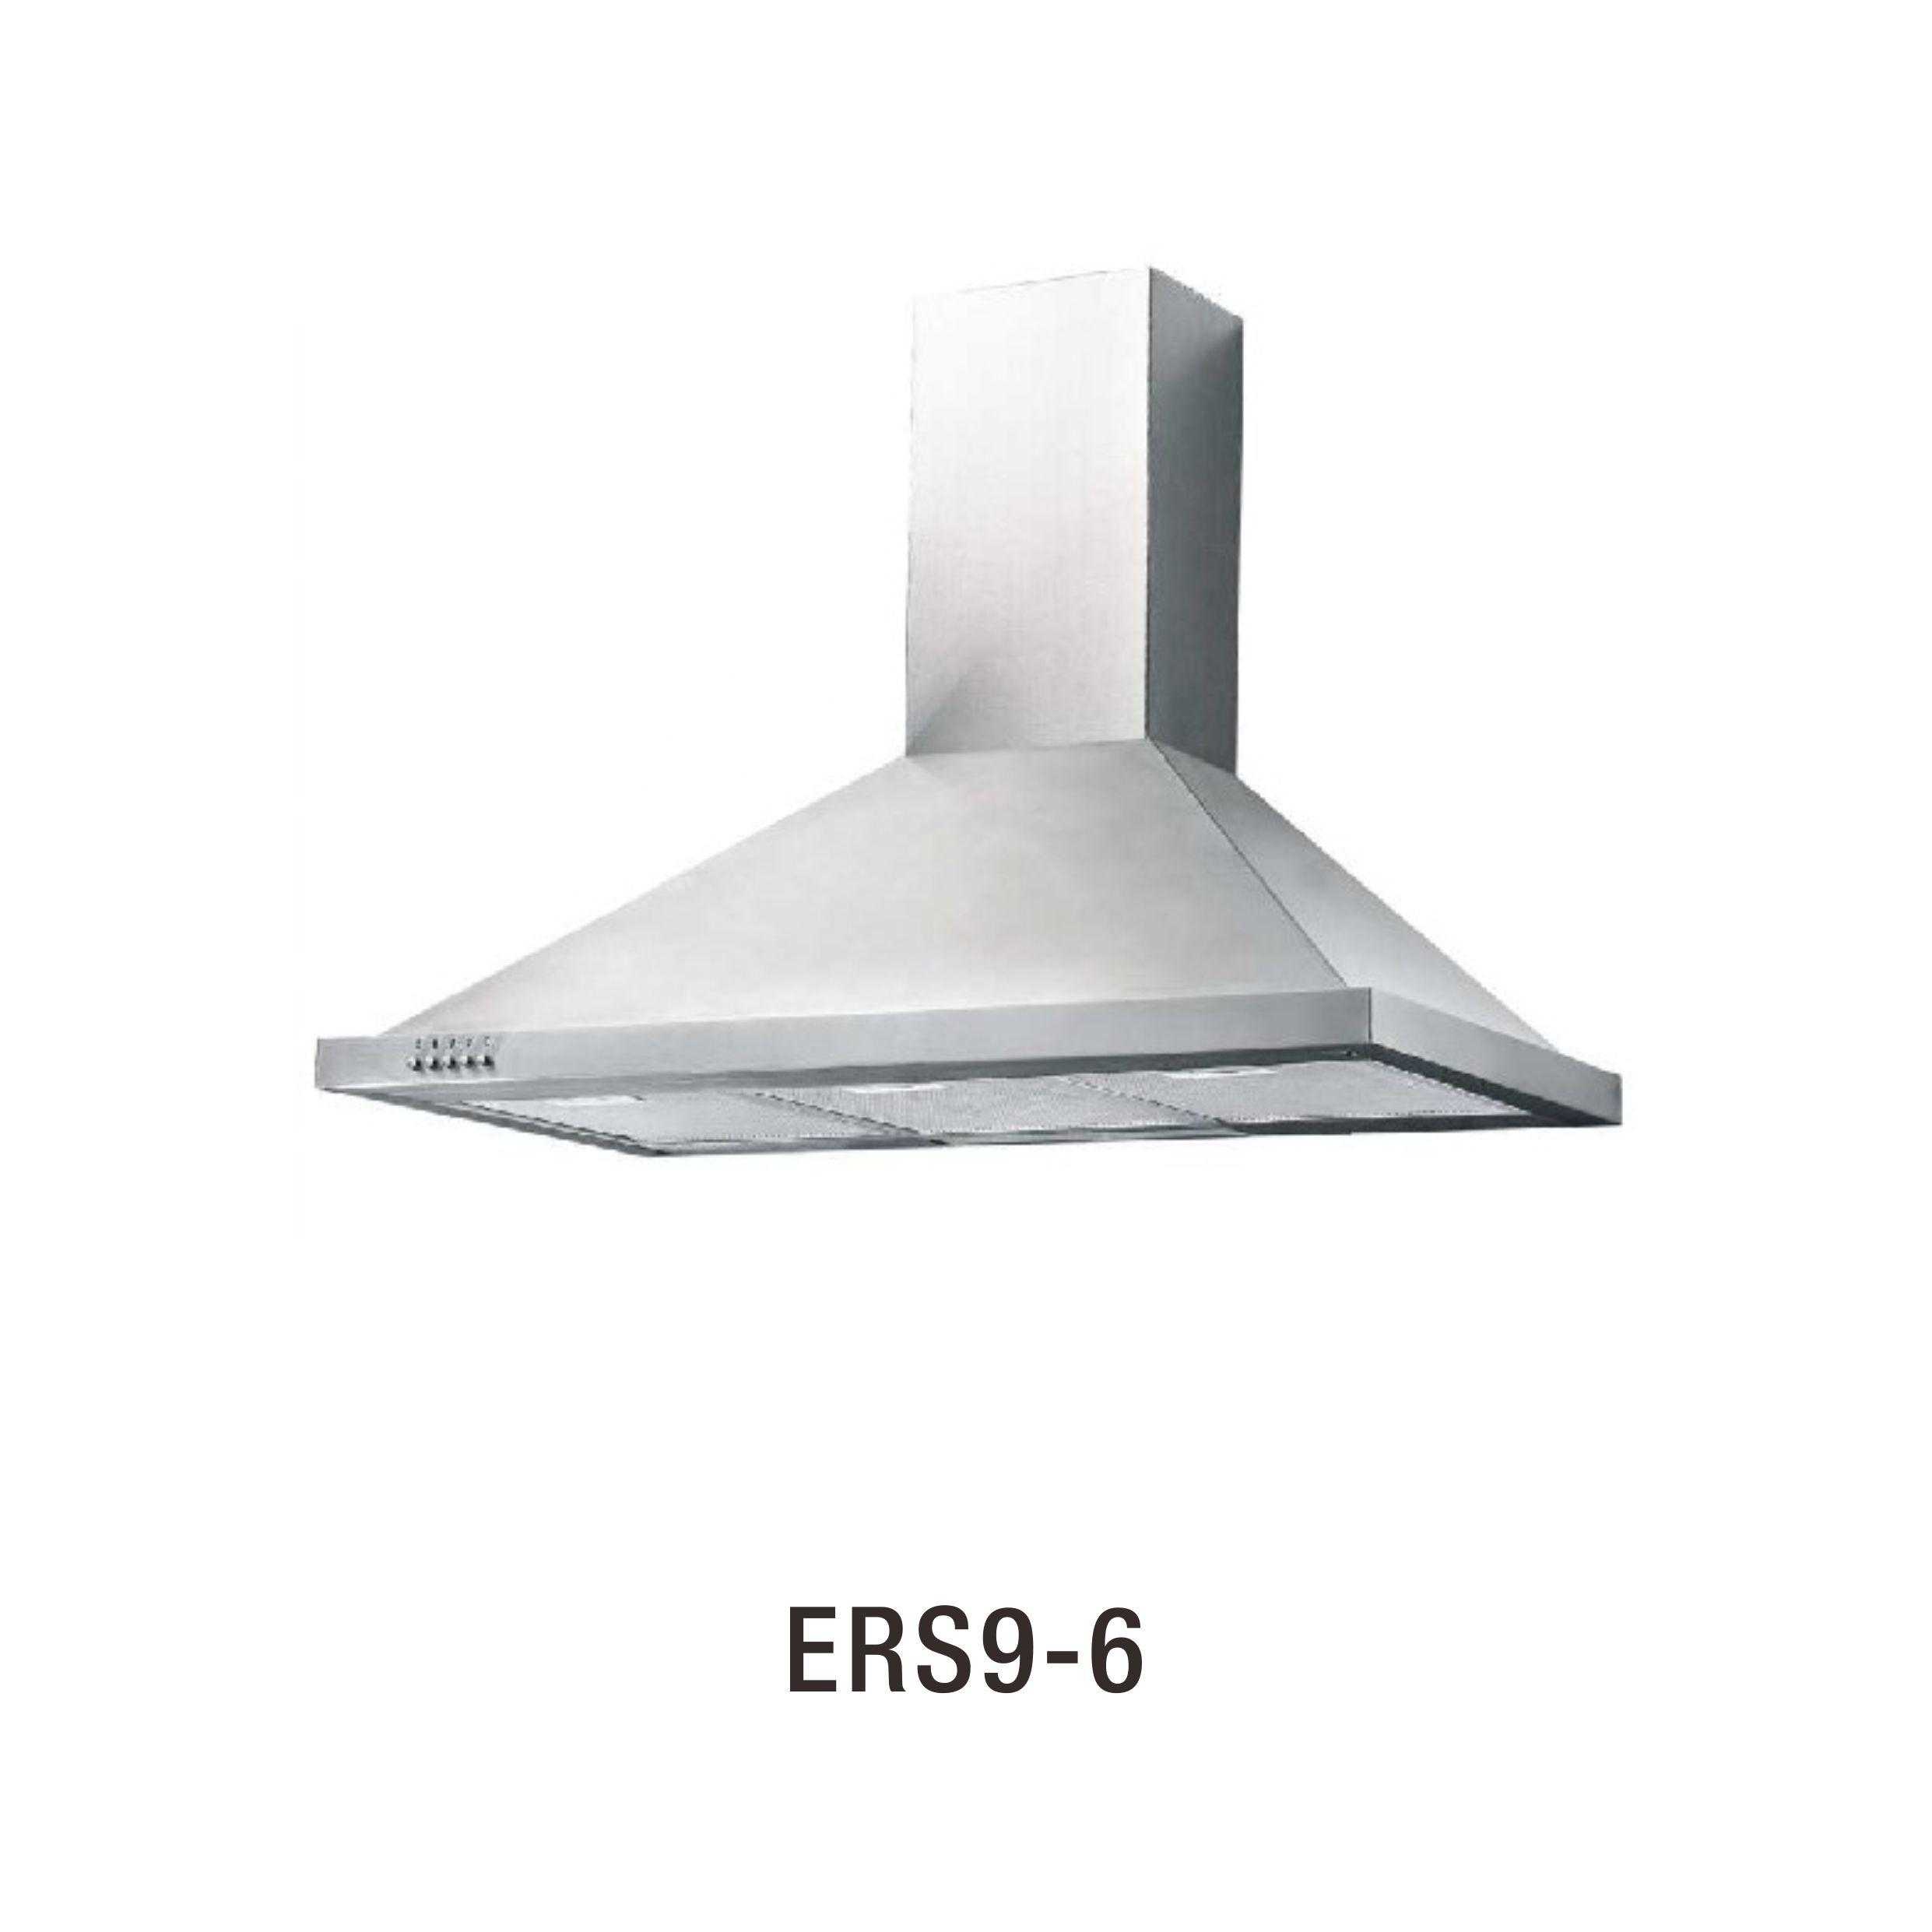 Ers9-6 Used Honey Extractor Range Hood 90cm Roof Kitchen Exhaust Fan - Buy  Used Honey Extractor,Range Hood 90cm,Roof Kitchen Exhaust Fan Product on